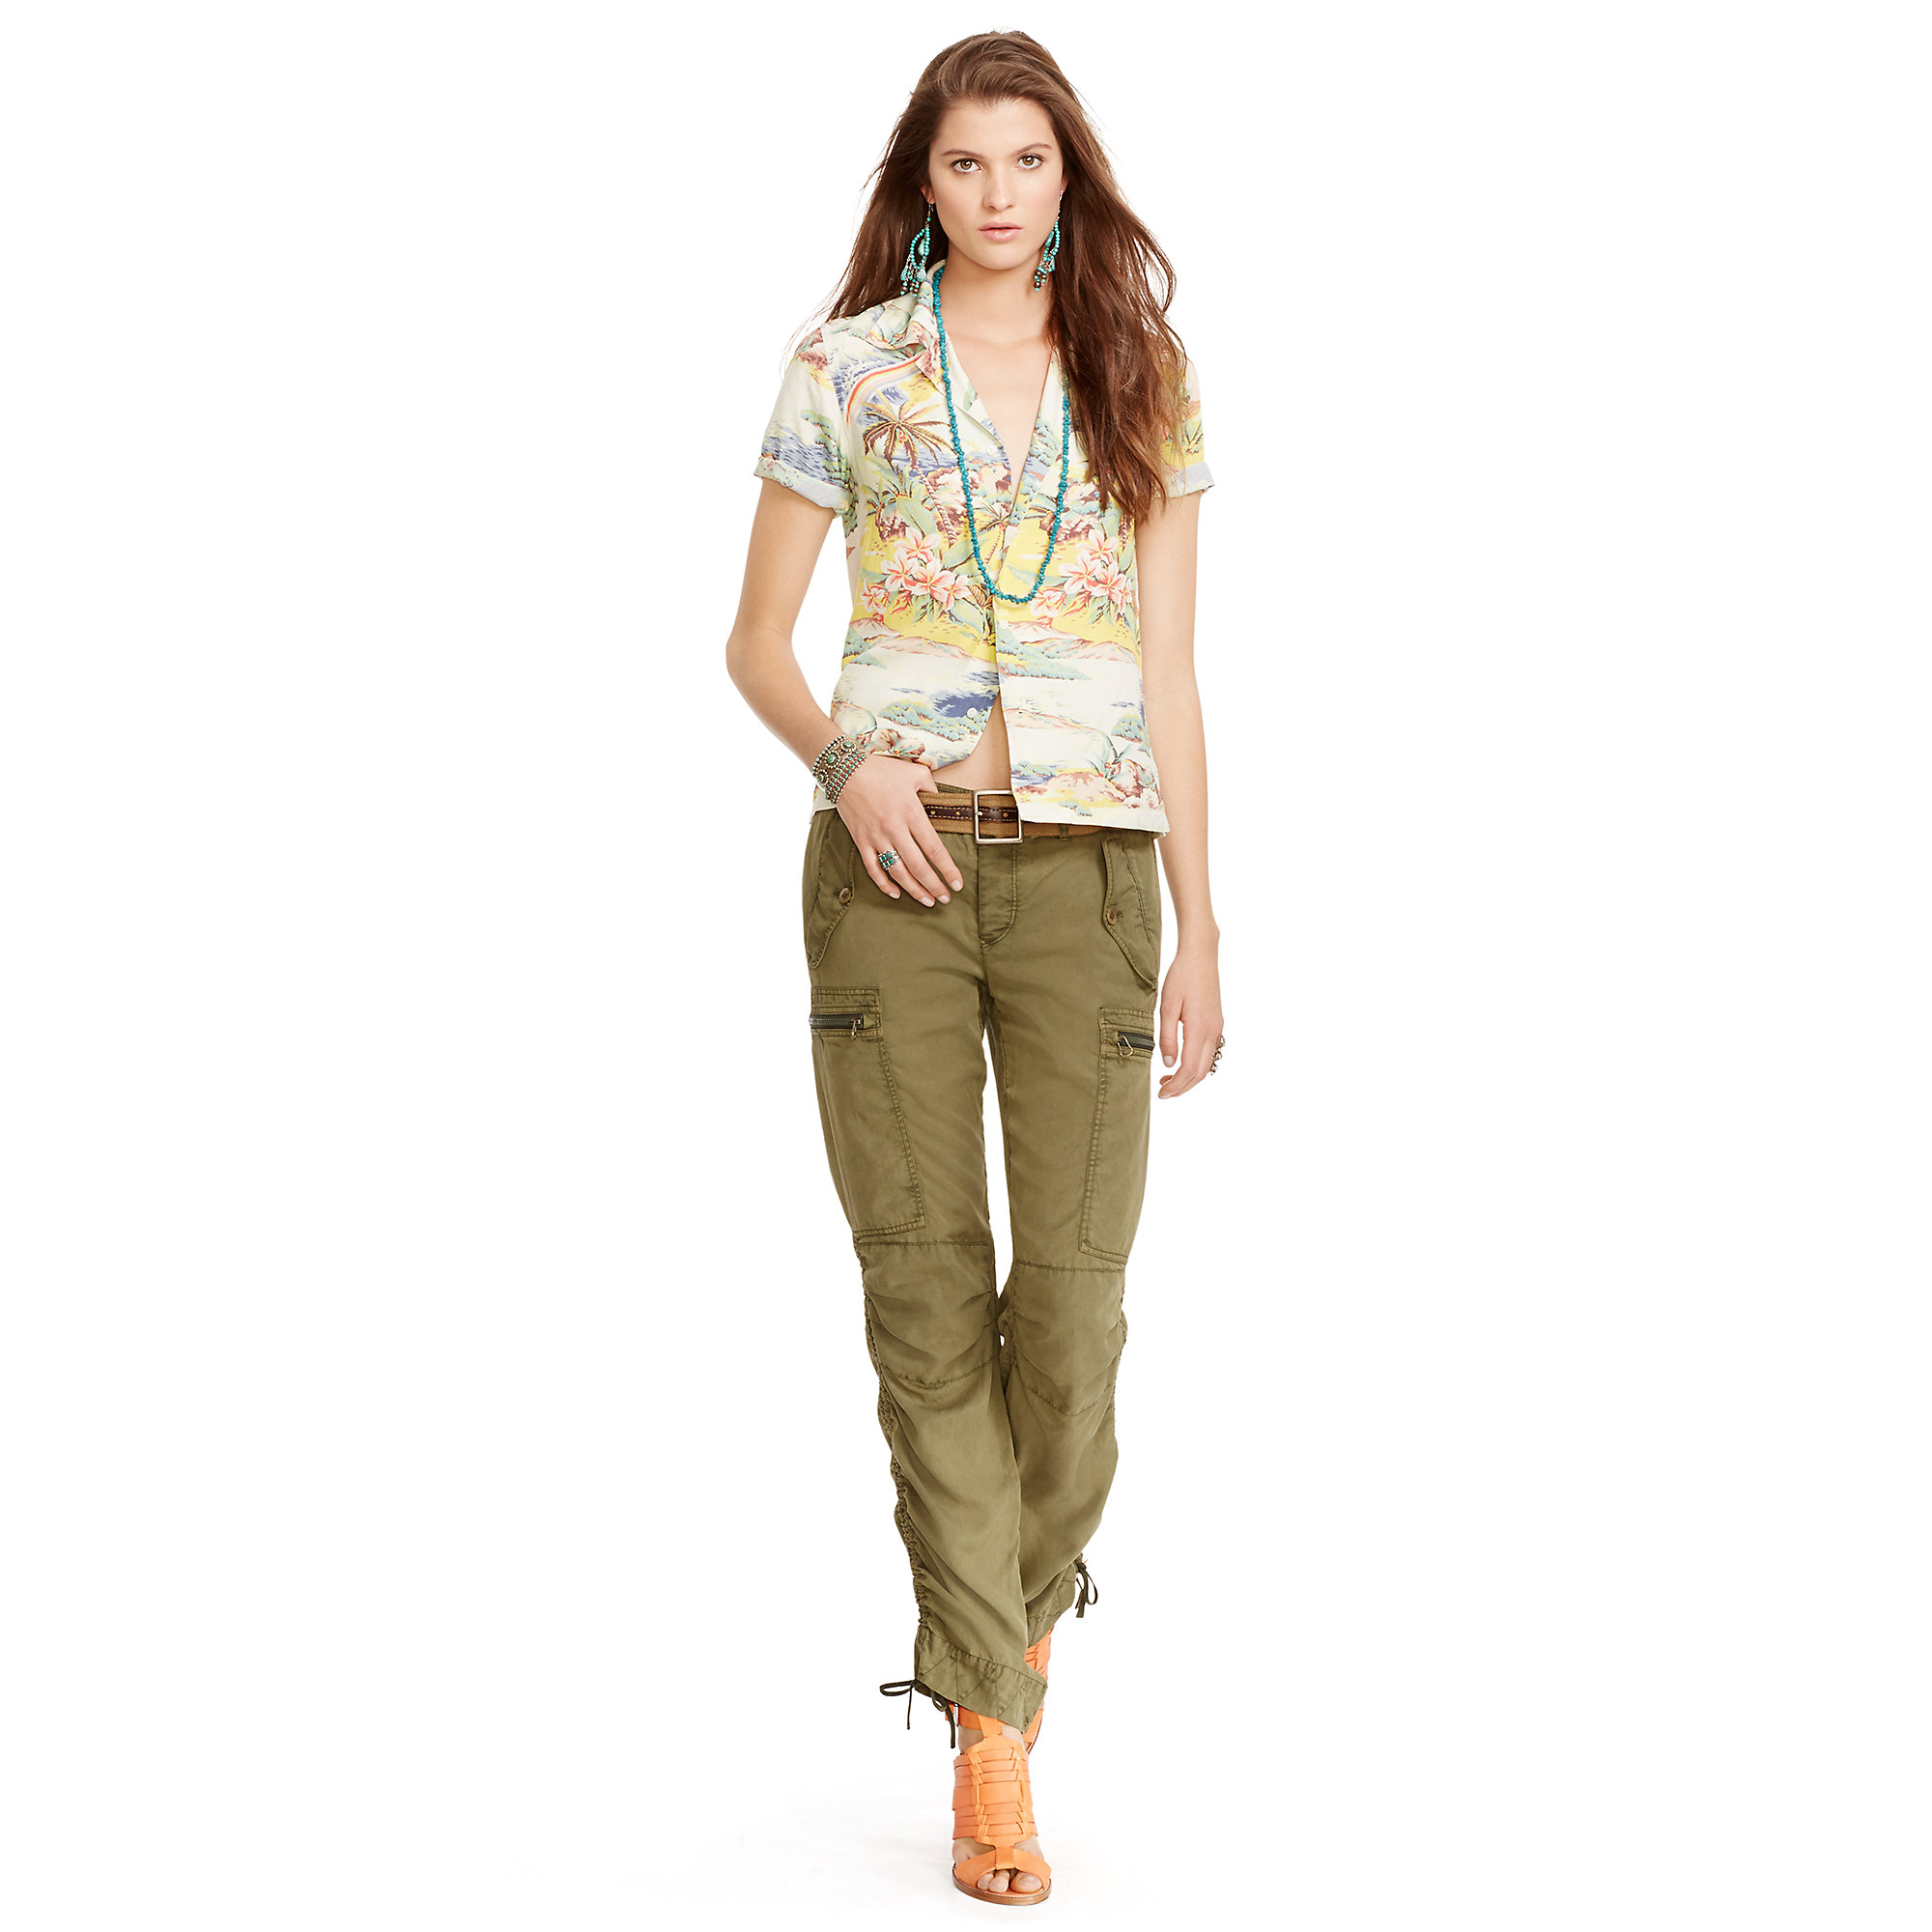 Awesome Polo Ralph Lauren Women39s Skinny Utility Cargo Pant  Walmartcom